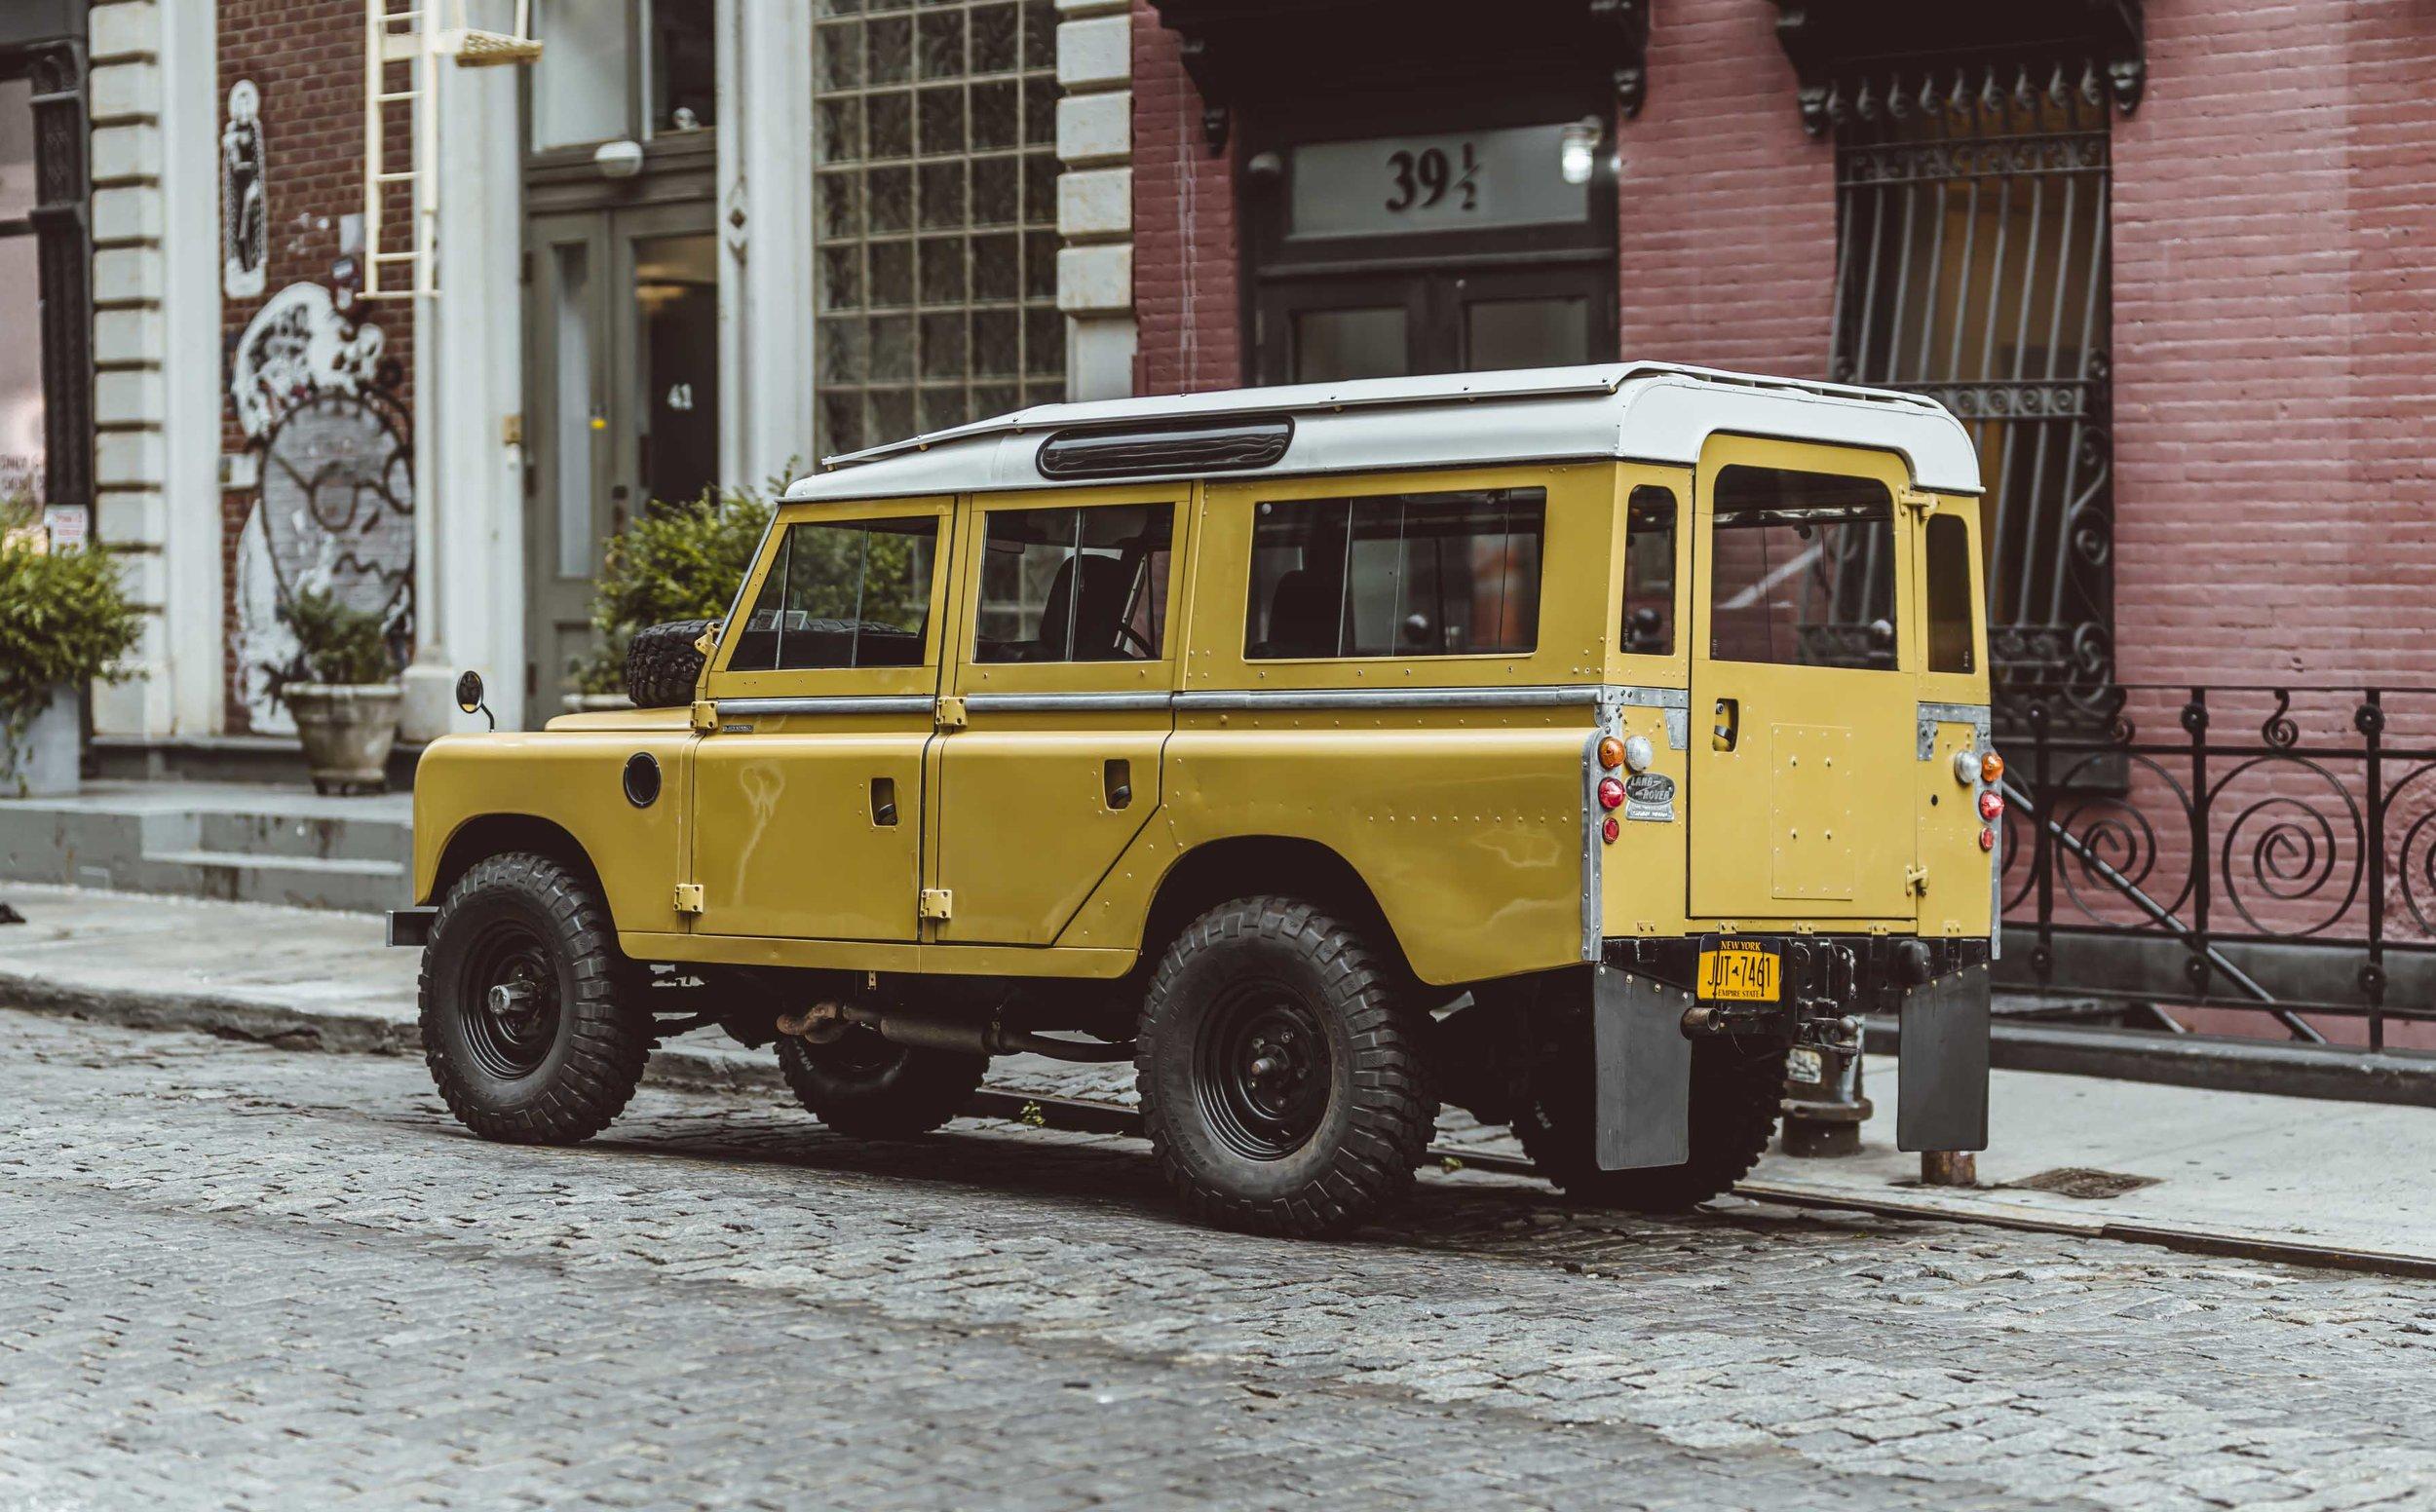 1975_Land_Rover_Series_III_109_Bahama_Gold_Large_0000_Layer 31.jpg